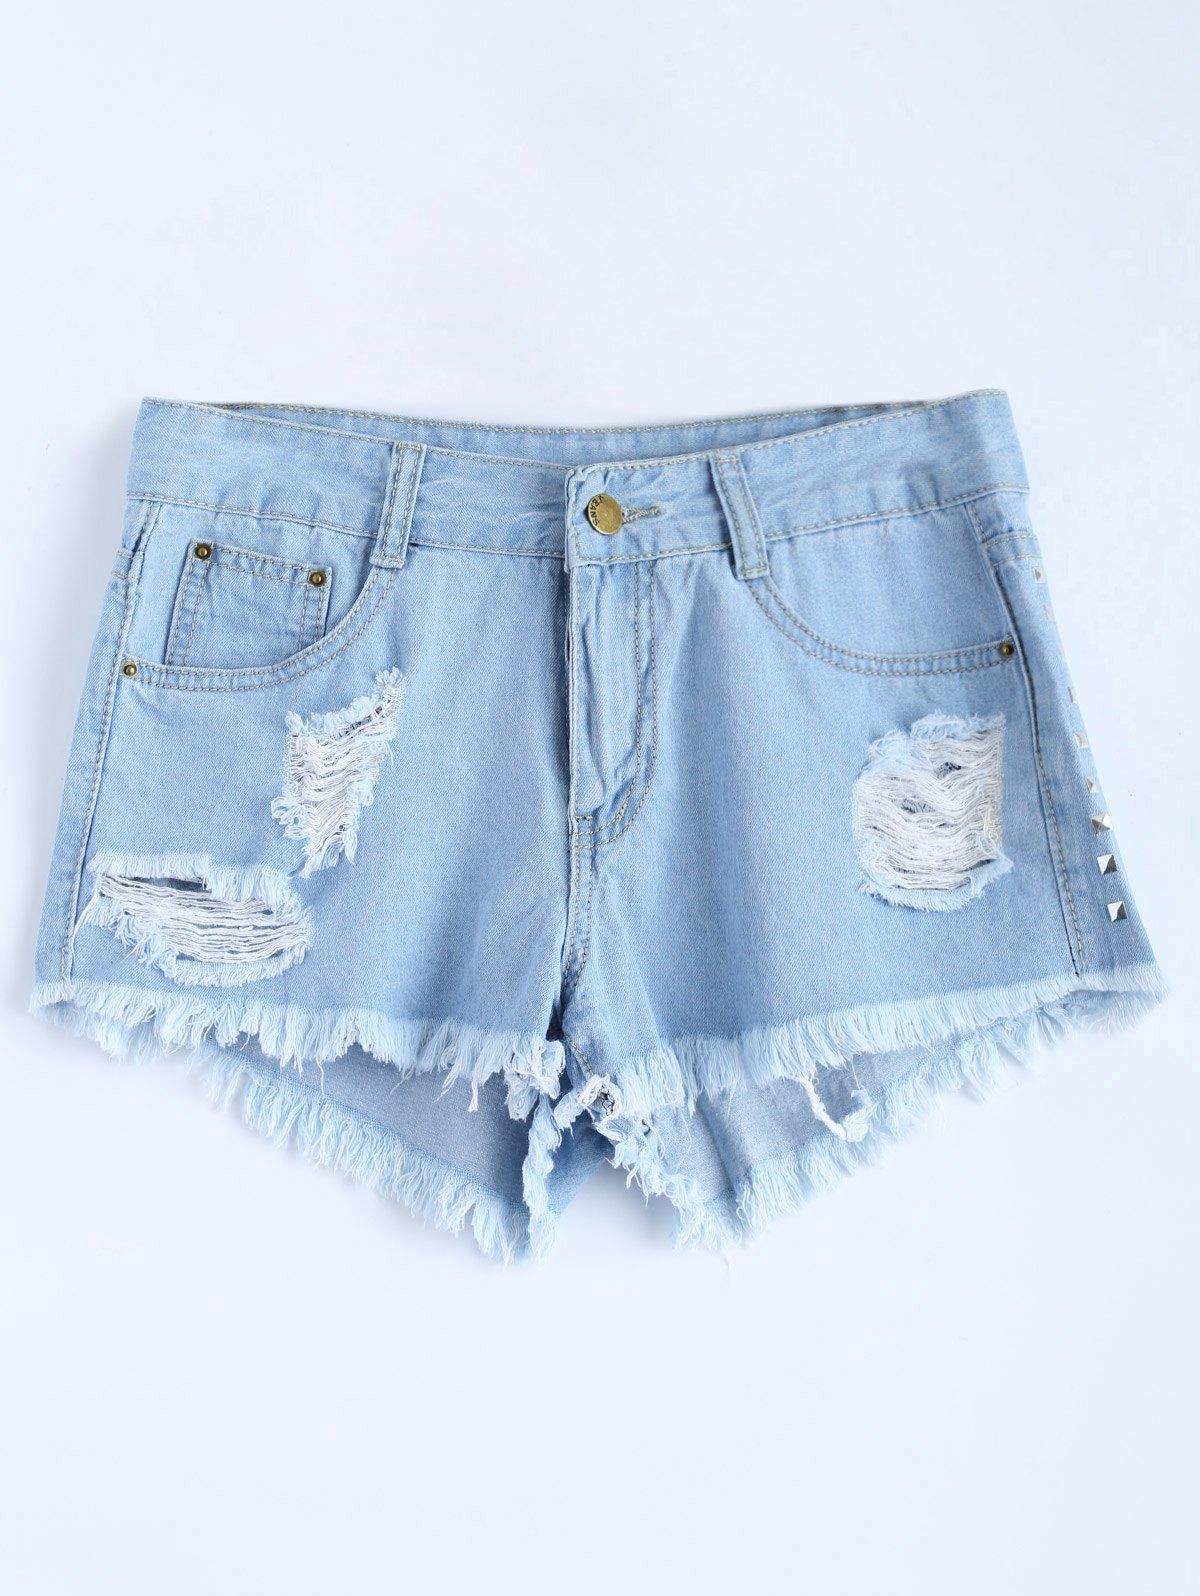 Light Wash Ripped Rivet Denim Shorts